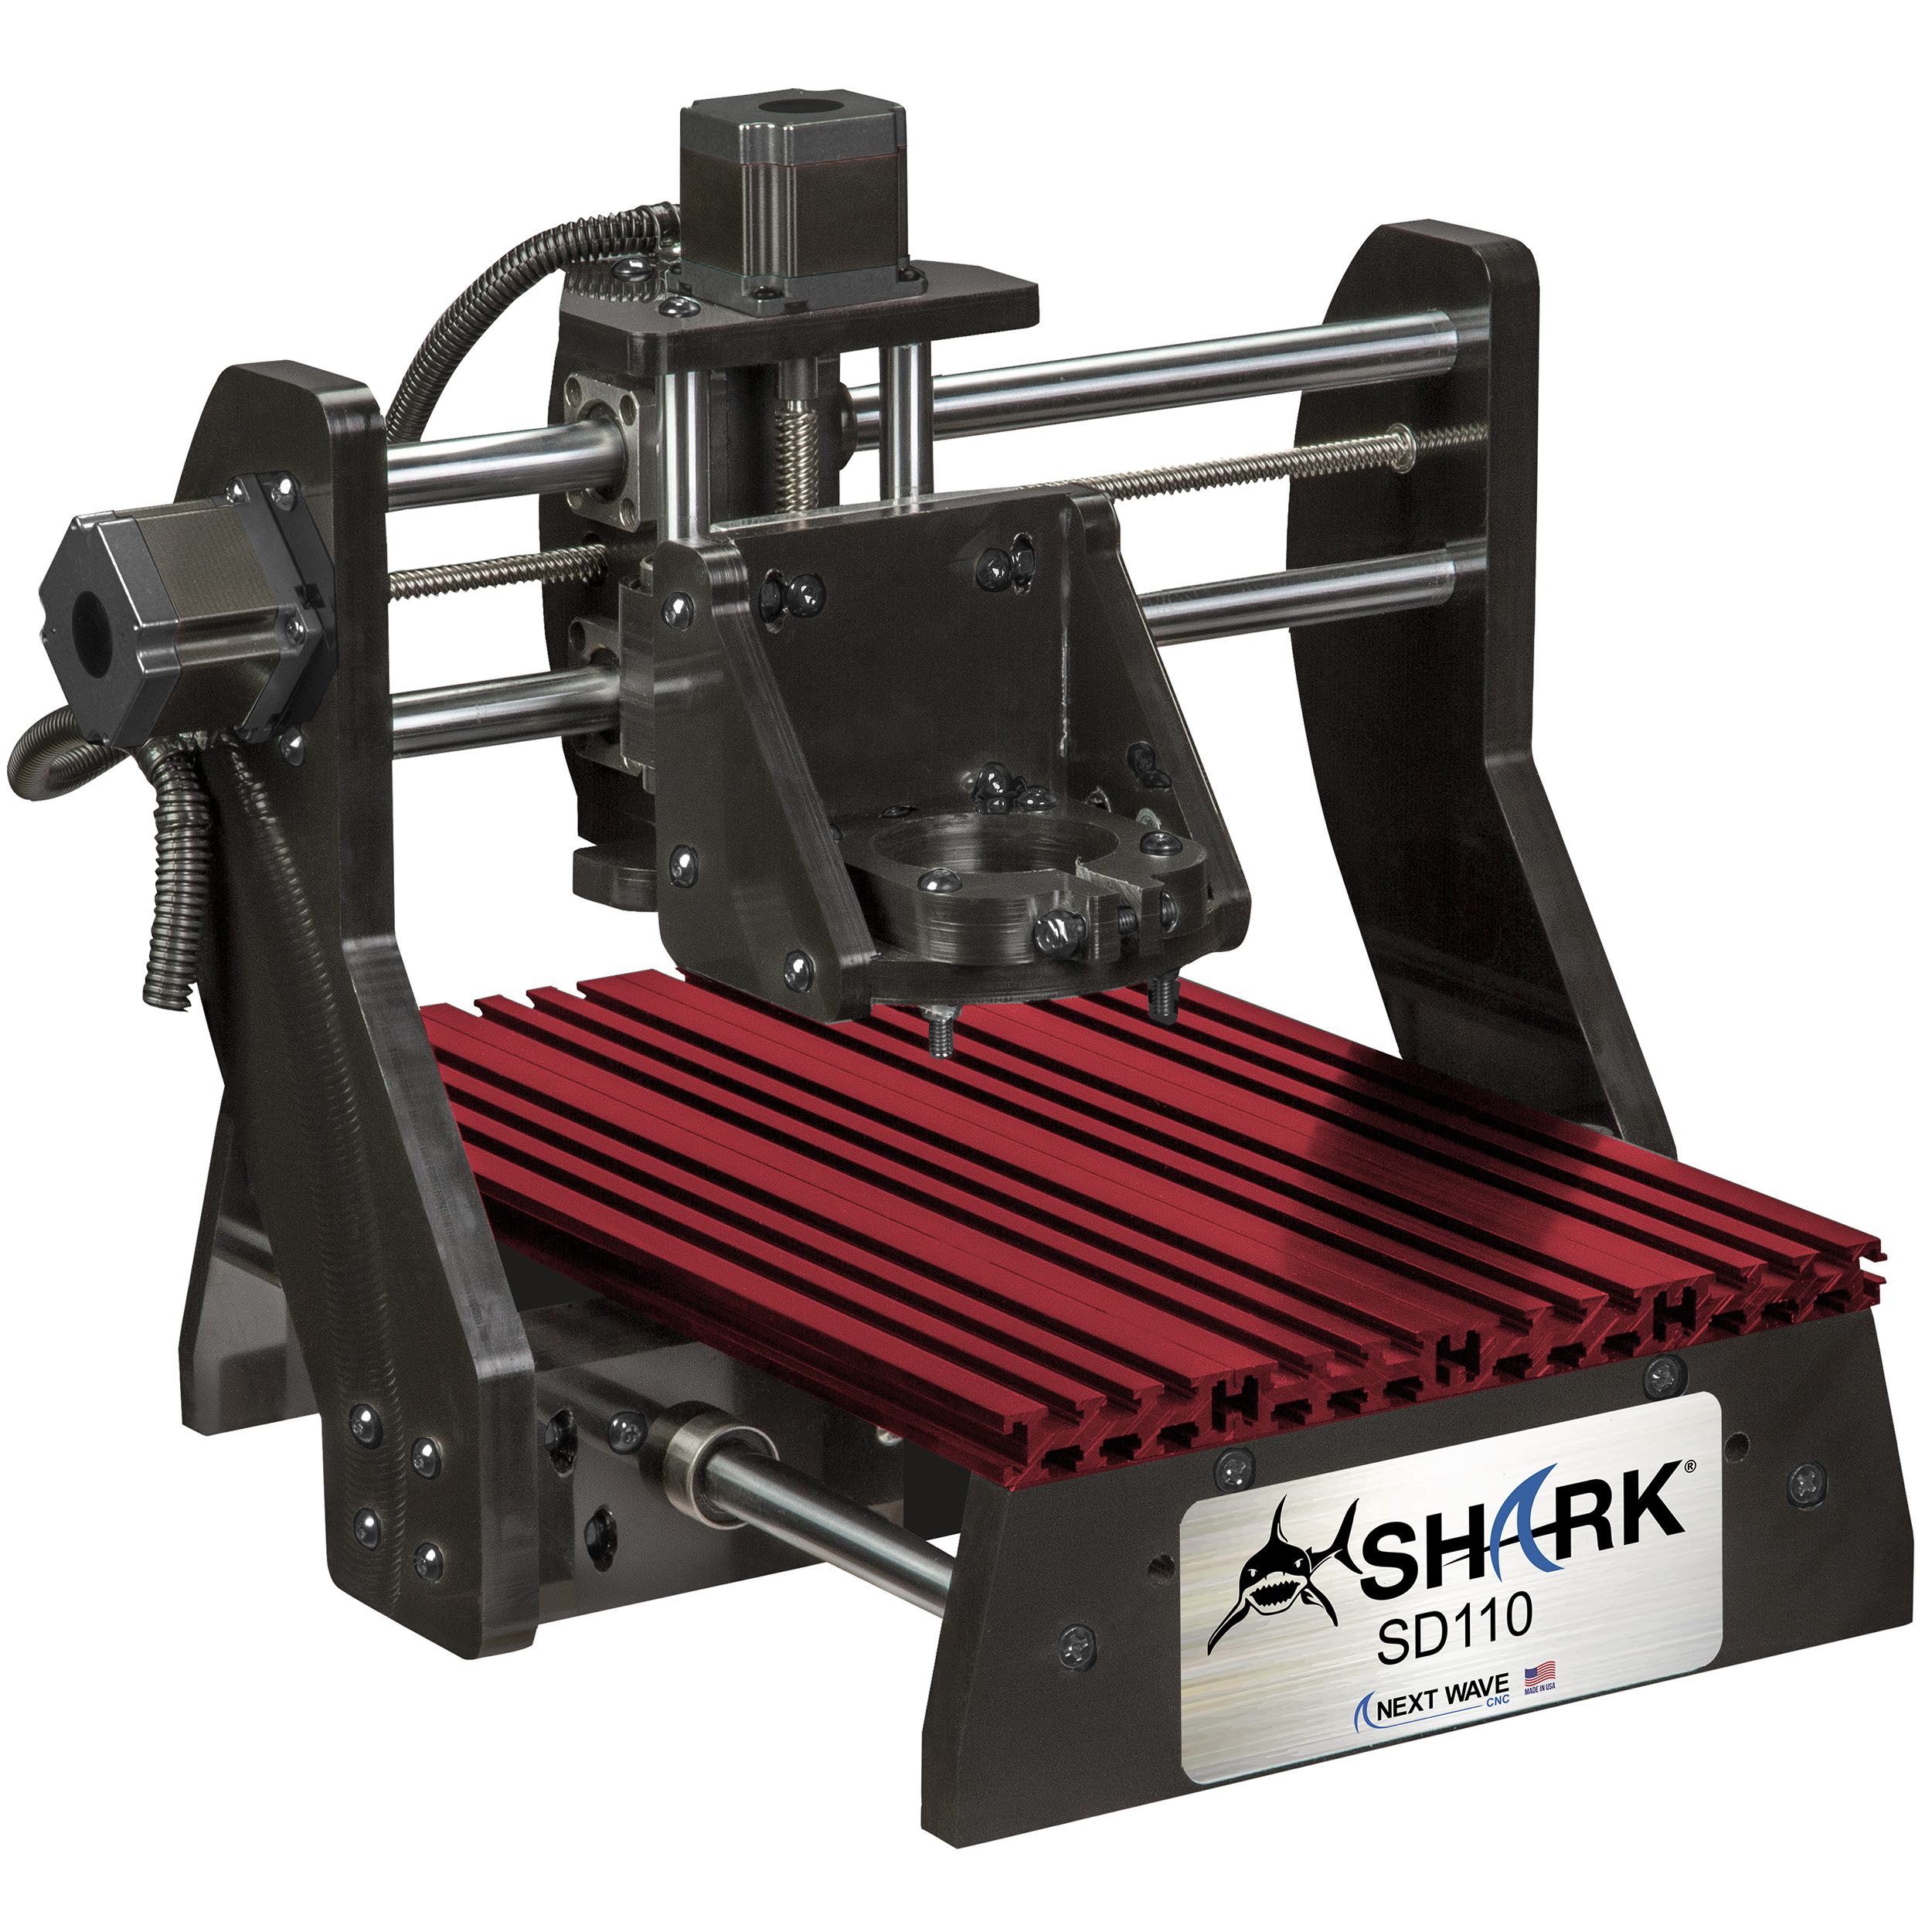 SHARK SD110 CNC Machine